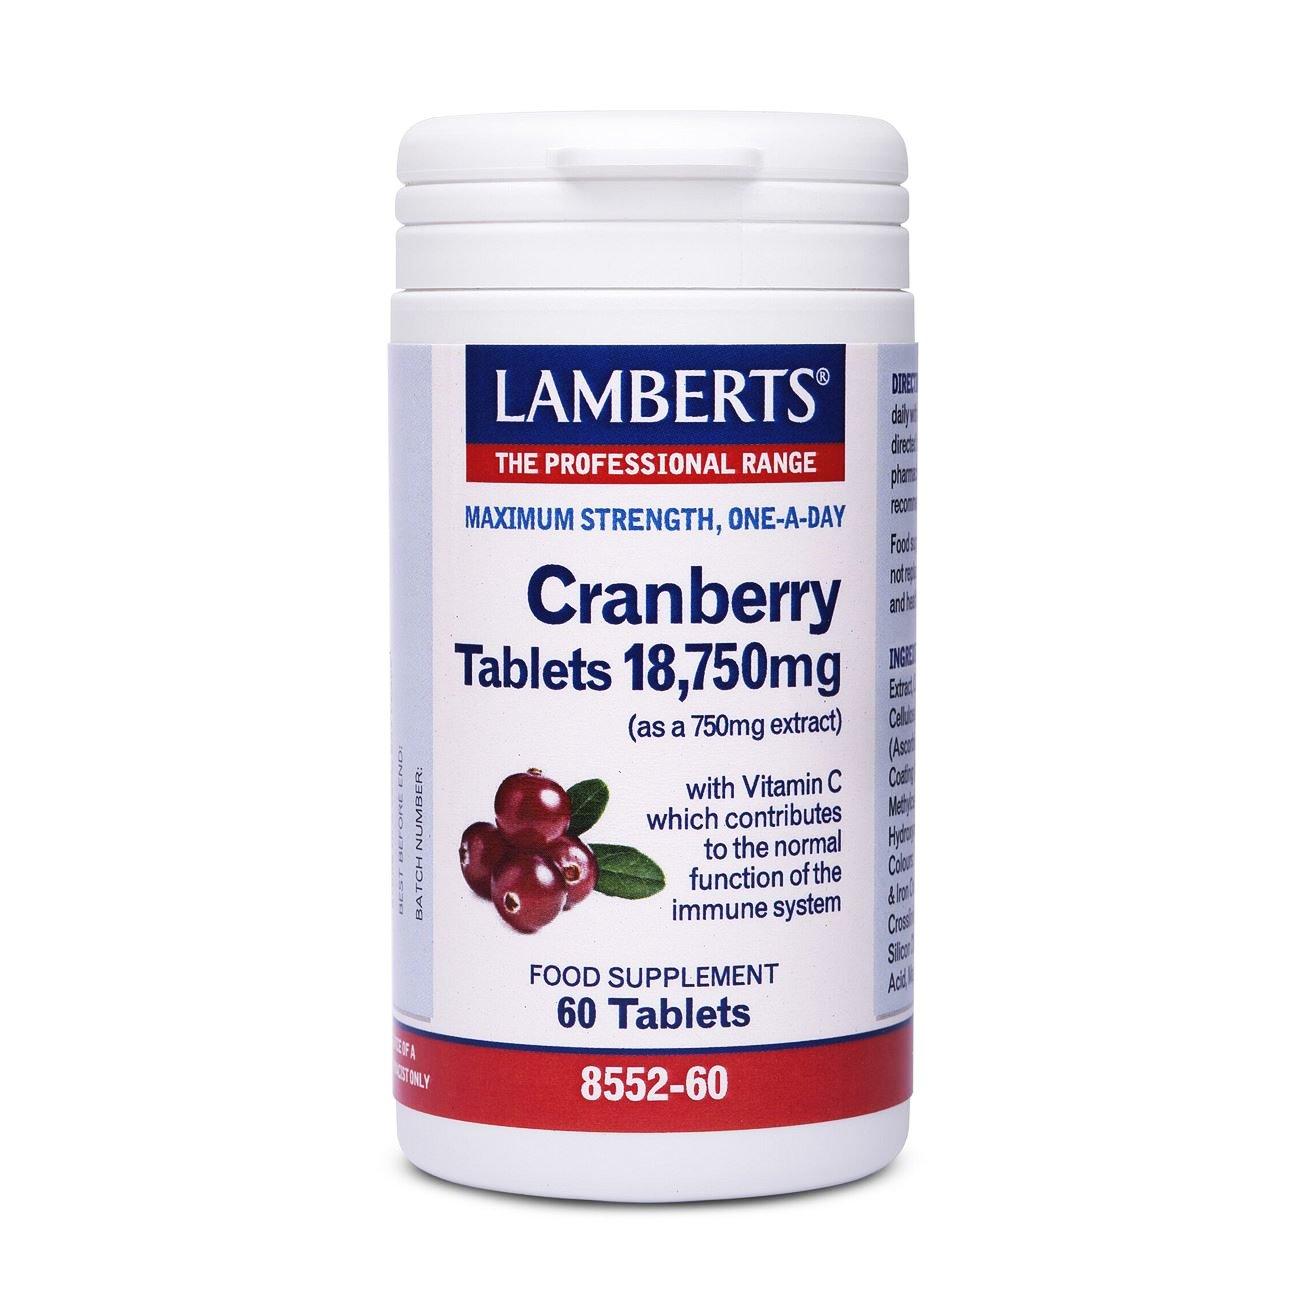 Lamberts Cranberry Συμπλήρωμα Διατροφής για τη Διατήρηση της Υγείας του Ουροποιητικού Συστήματος 60 tabs